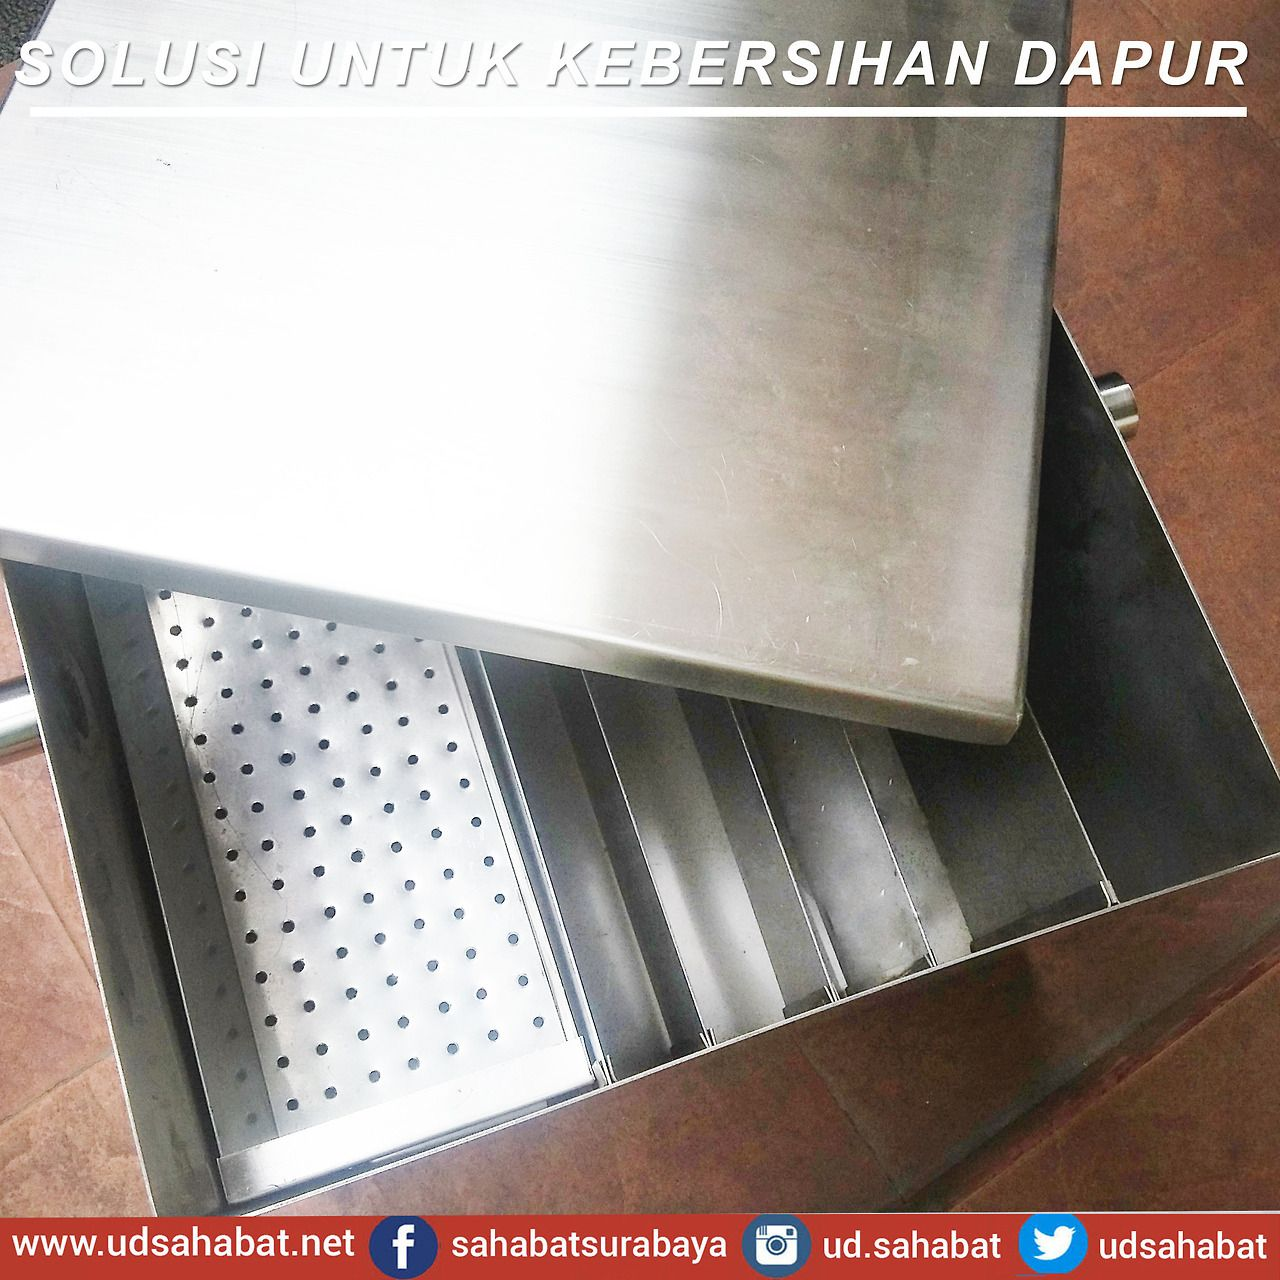 Jual Grease Trap Stainless Steel Surabaya Ud Sahabat Baliwerti 72 Apakah Anda Pemilik Usaha Kuliner